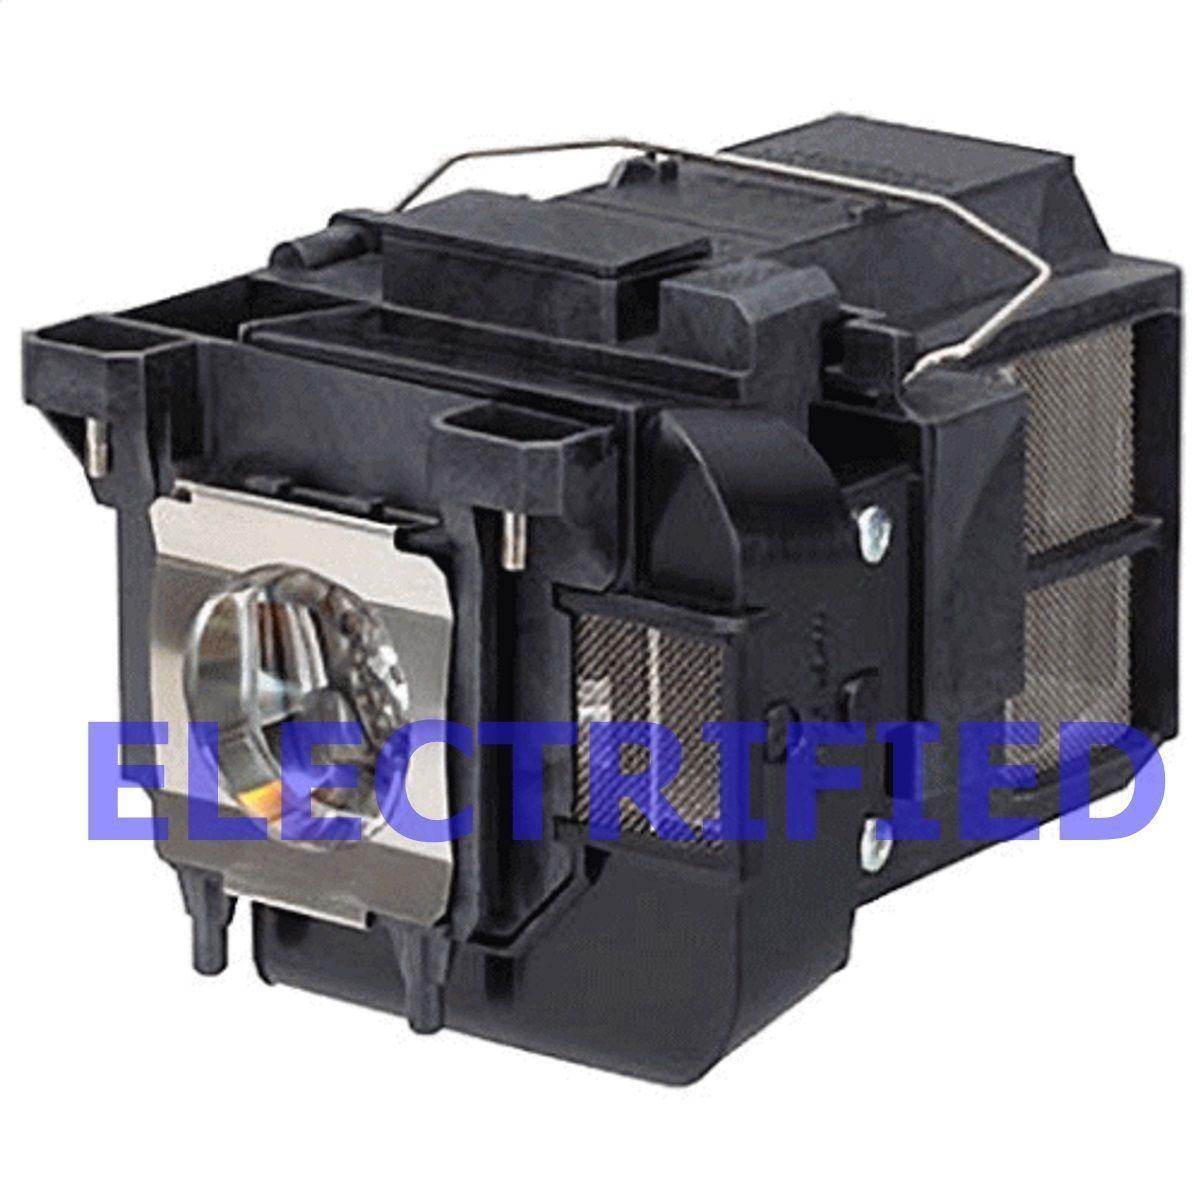 EPSON ELPLP77 OEM LAMP FOR EB-4650 EB-4750W EB-4850WU EB-4950WU Made By EPSON - $159.95